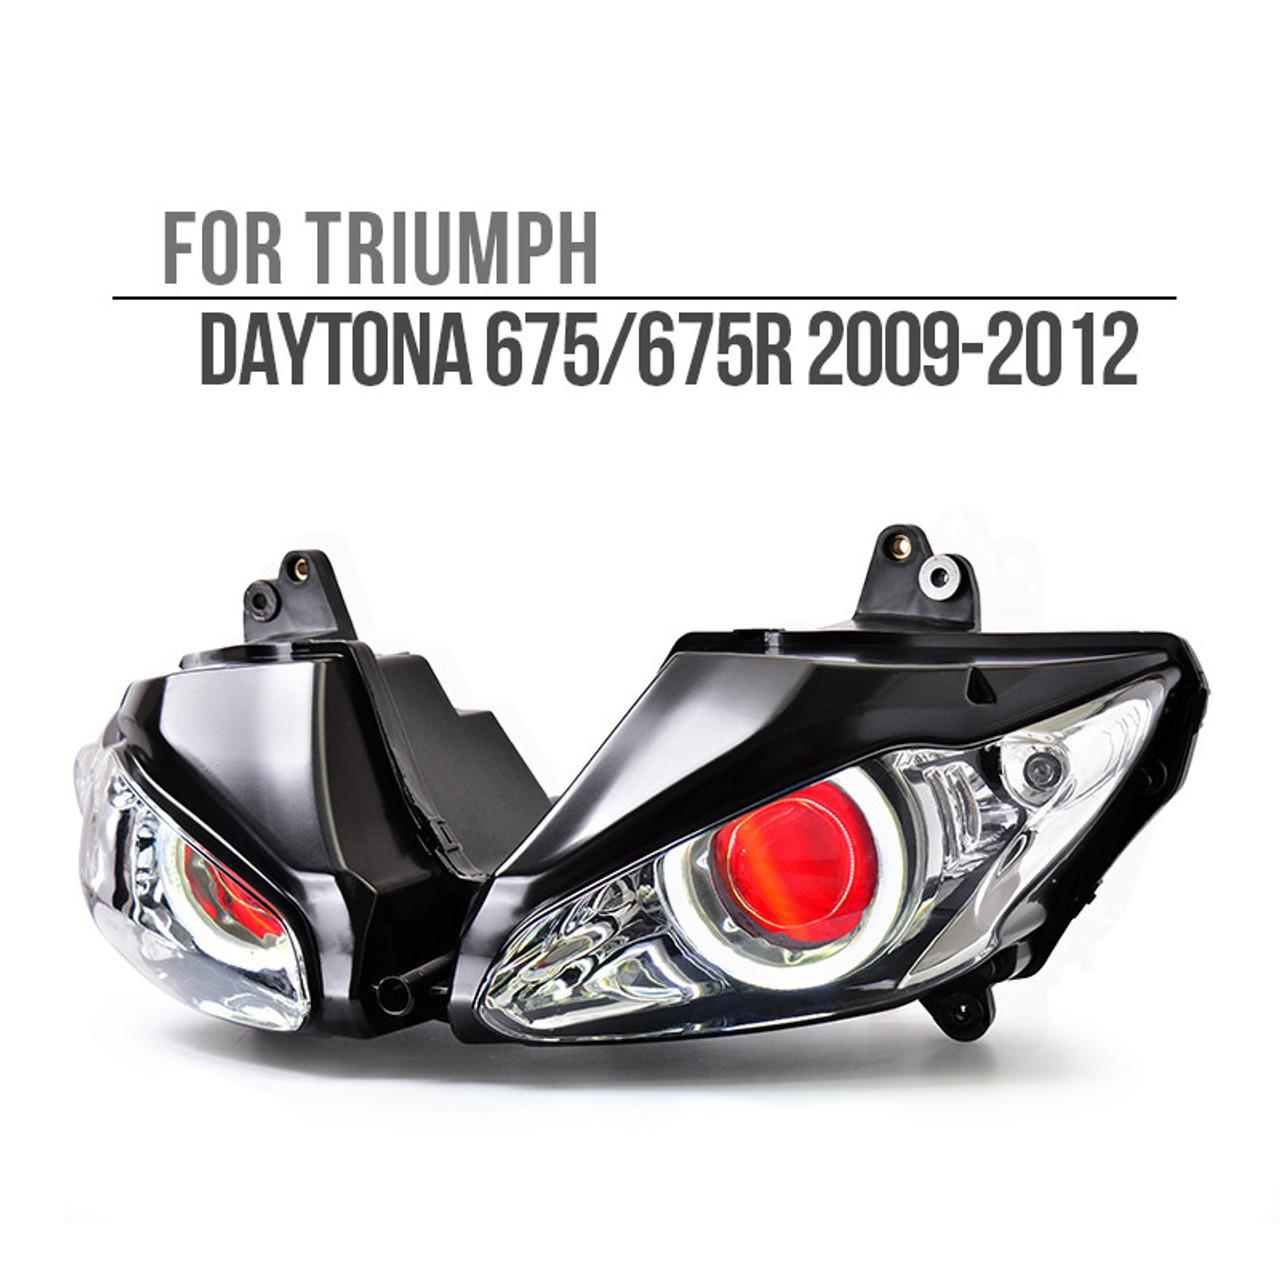 Triumph Daytona 675 Headlight 2009 2010 2011 2012